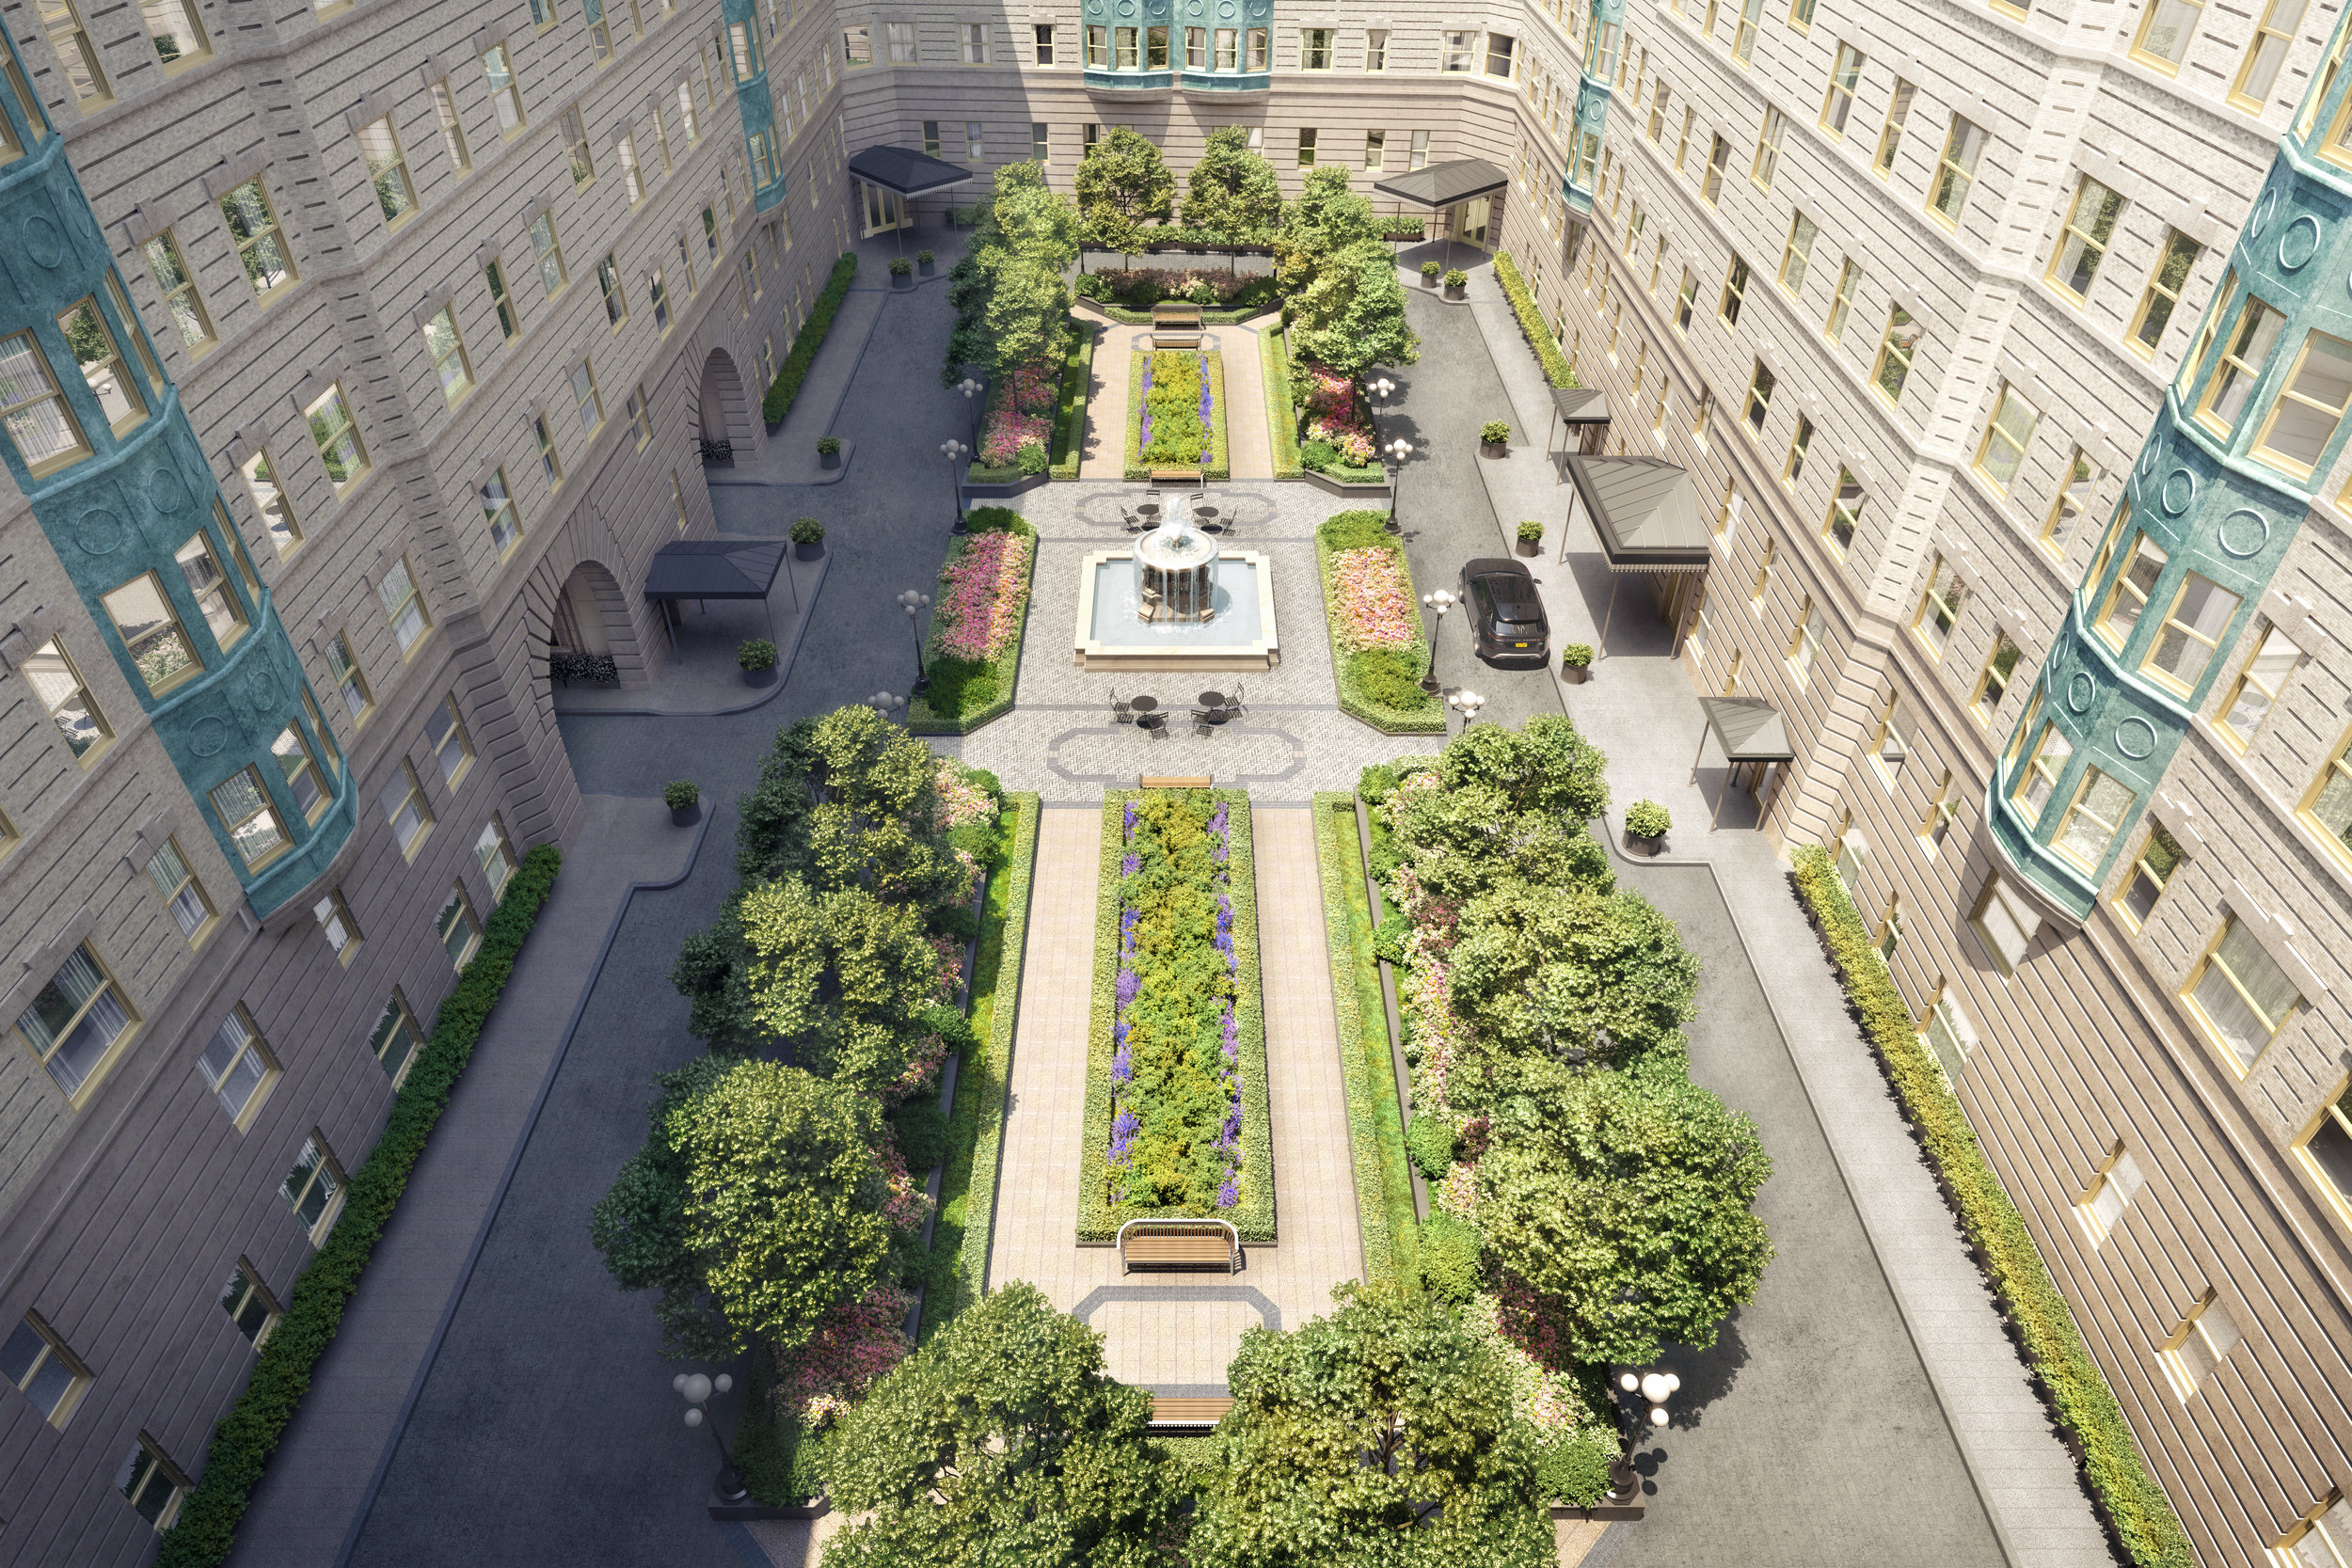 DBOX_HFZ_The Belnord_Courtyard_From Residence.jpg